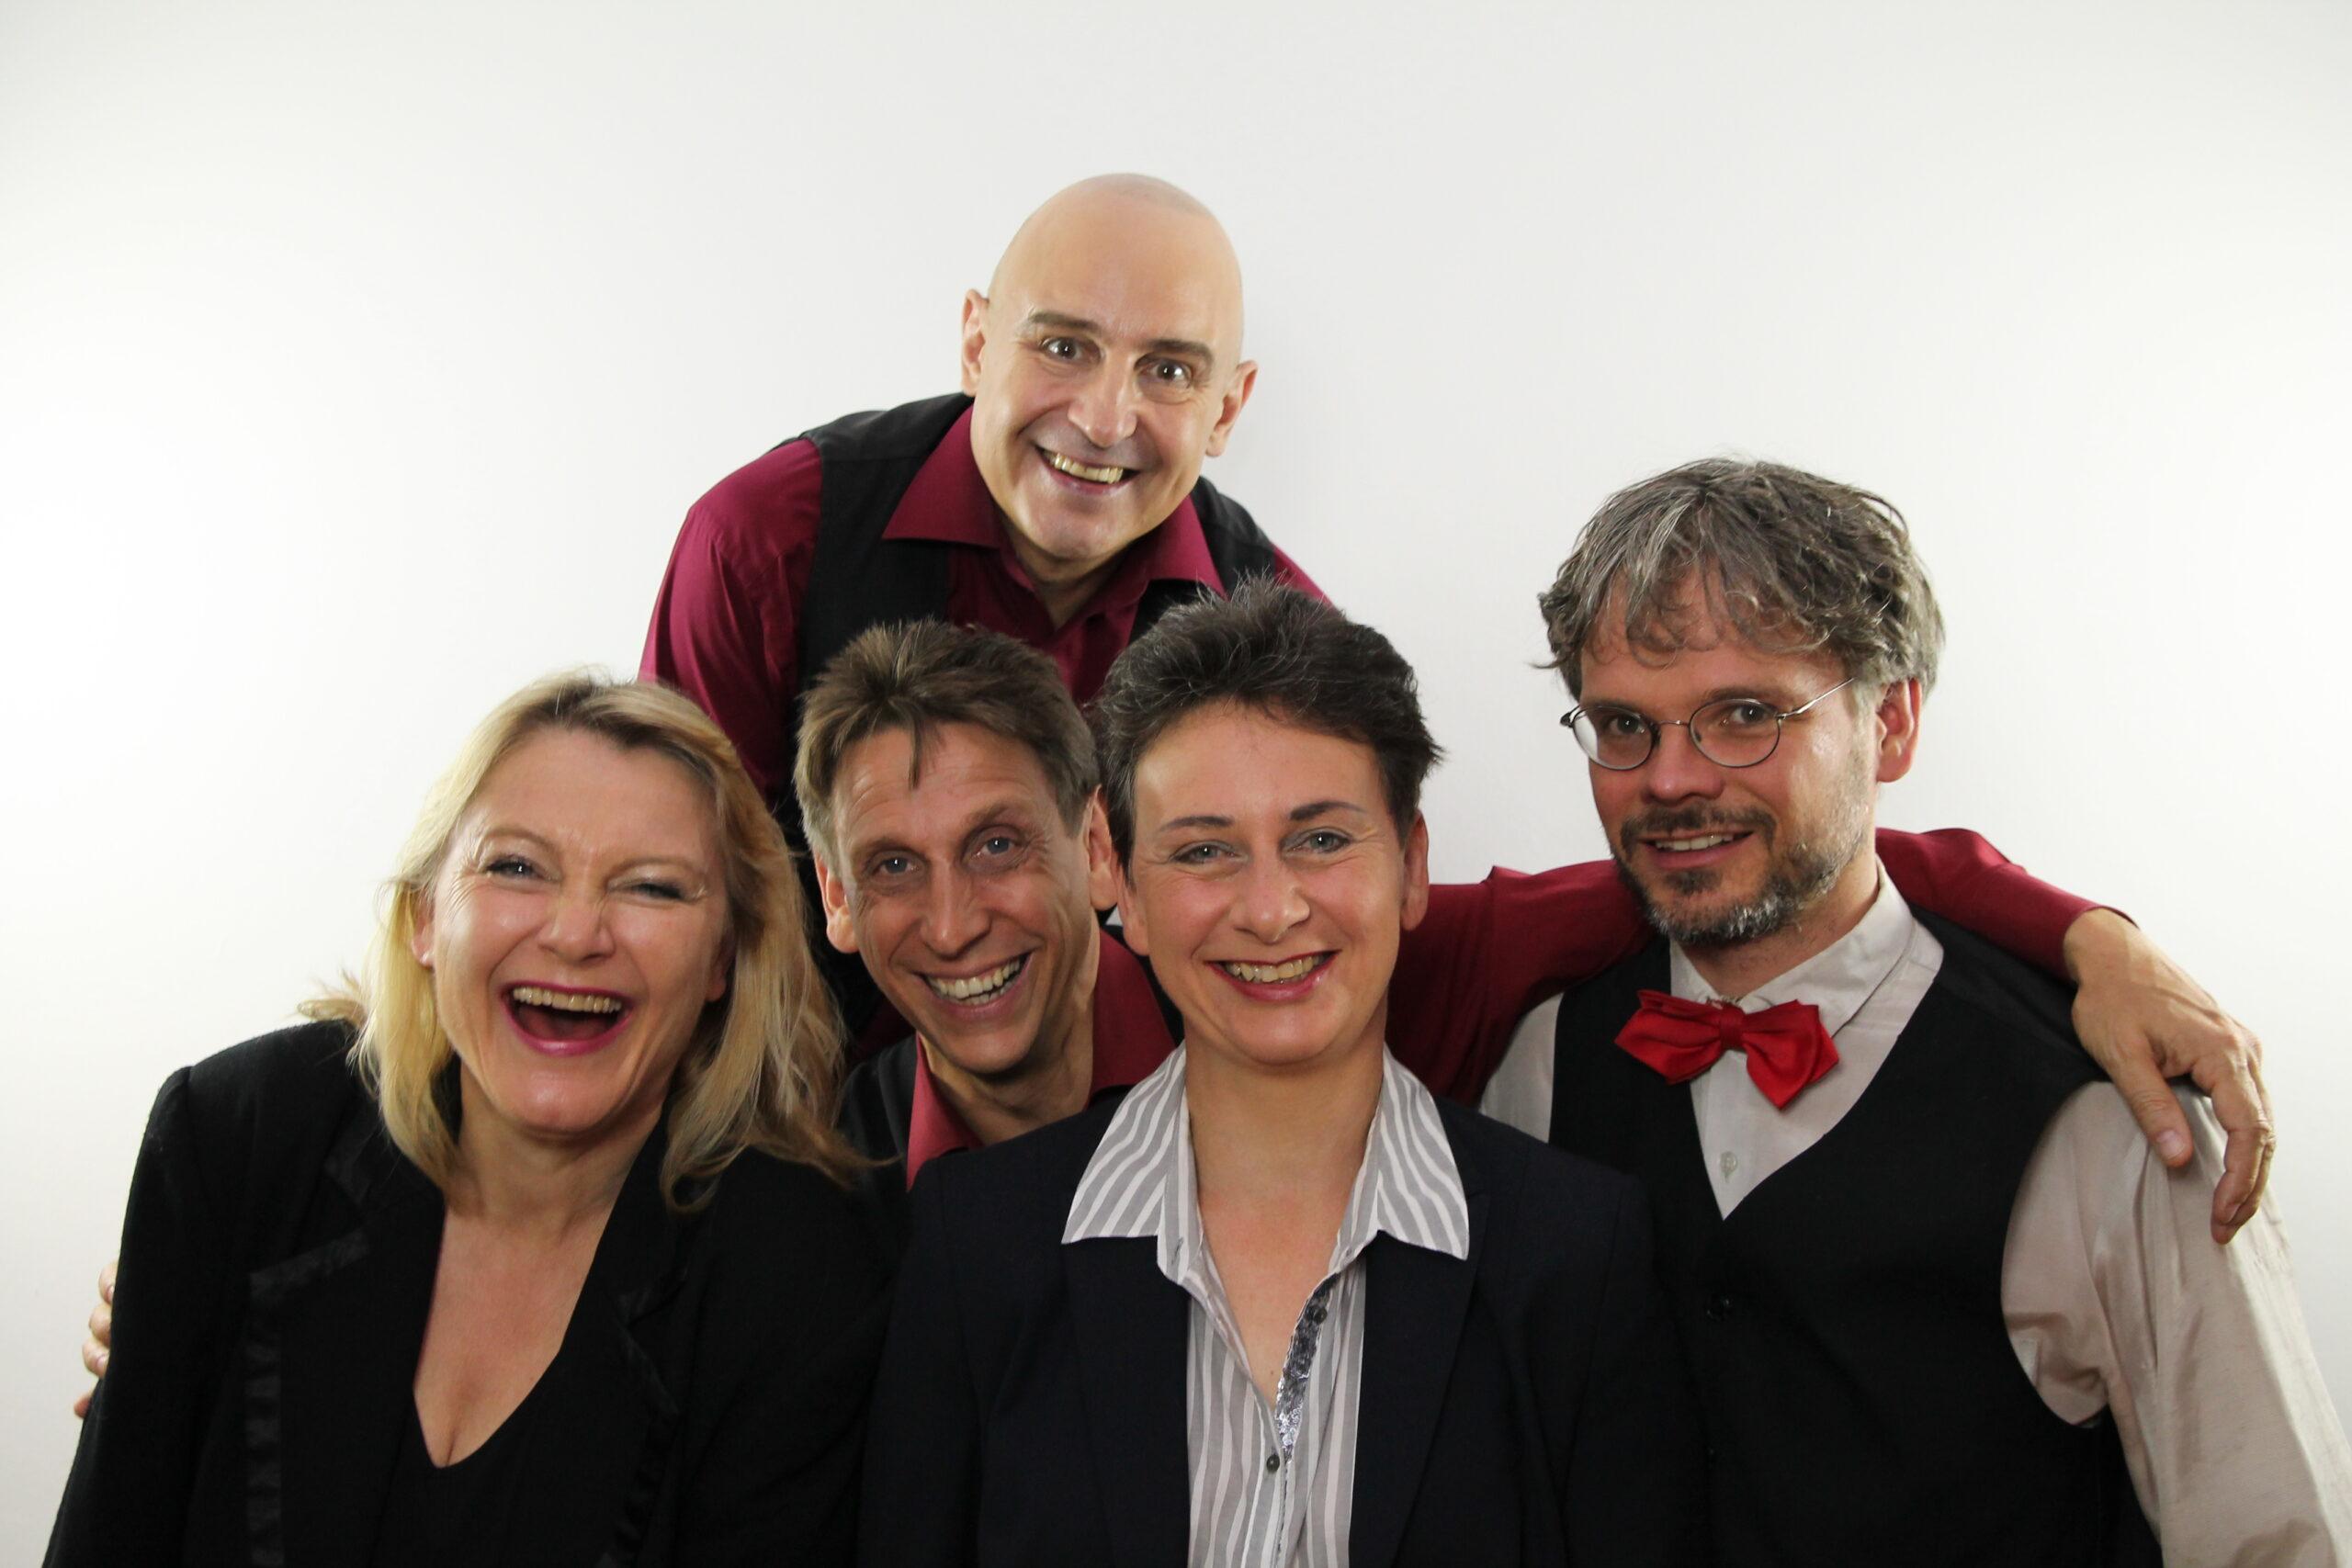 Das Ensemble des Kabarett-Theaters Leipziger Funzel